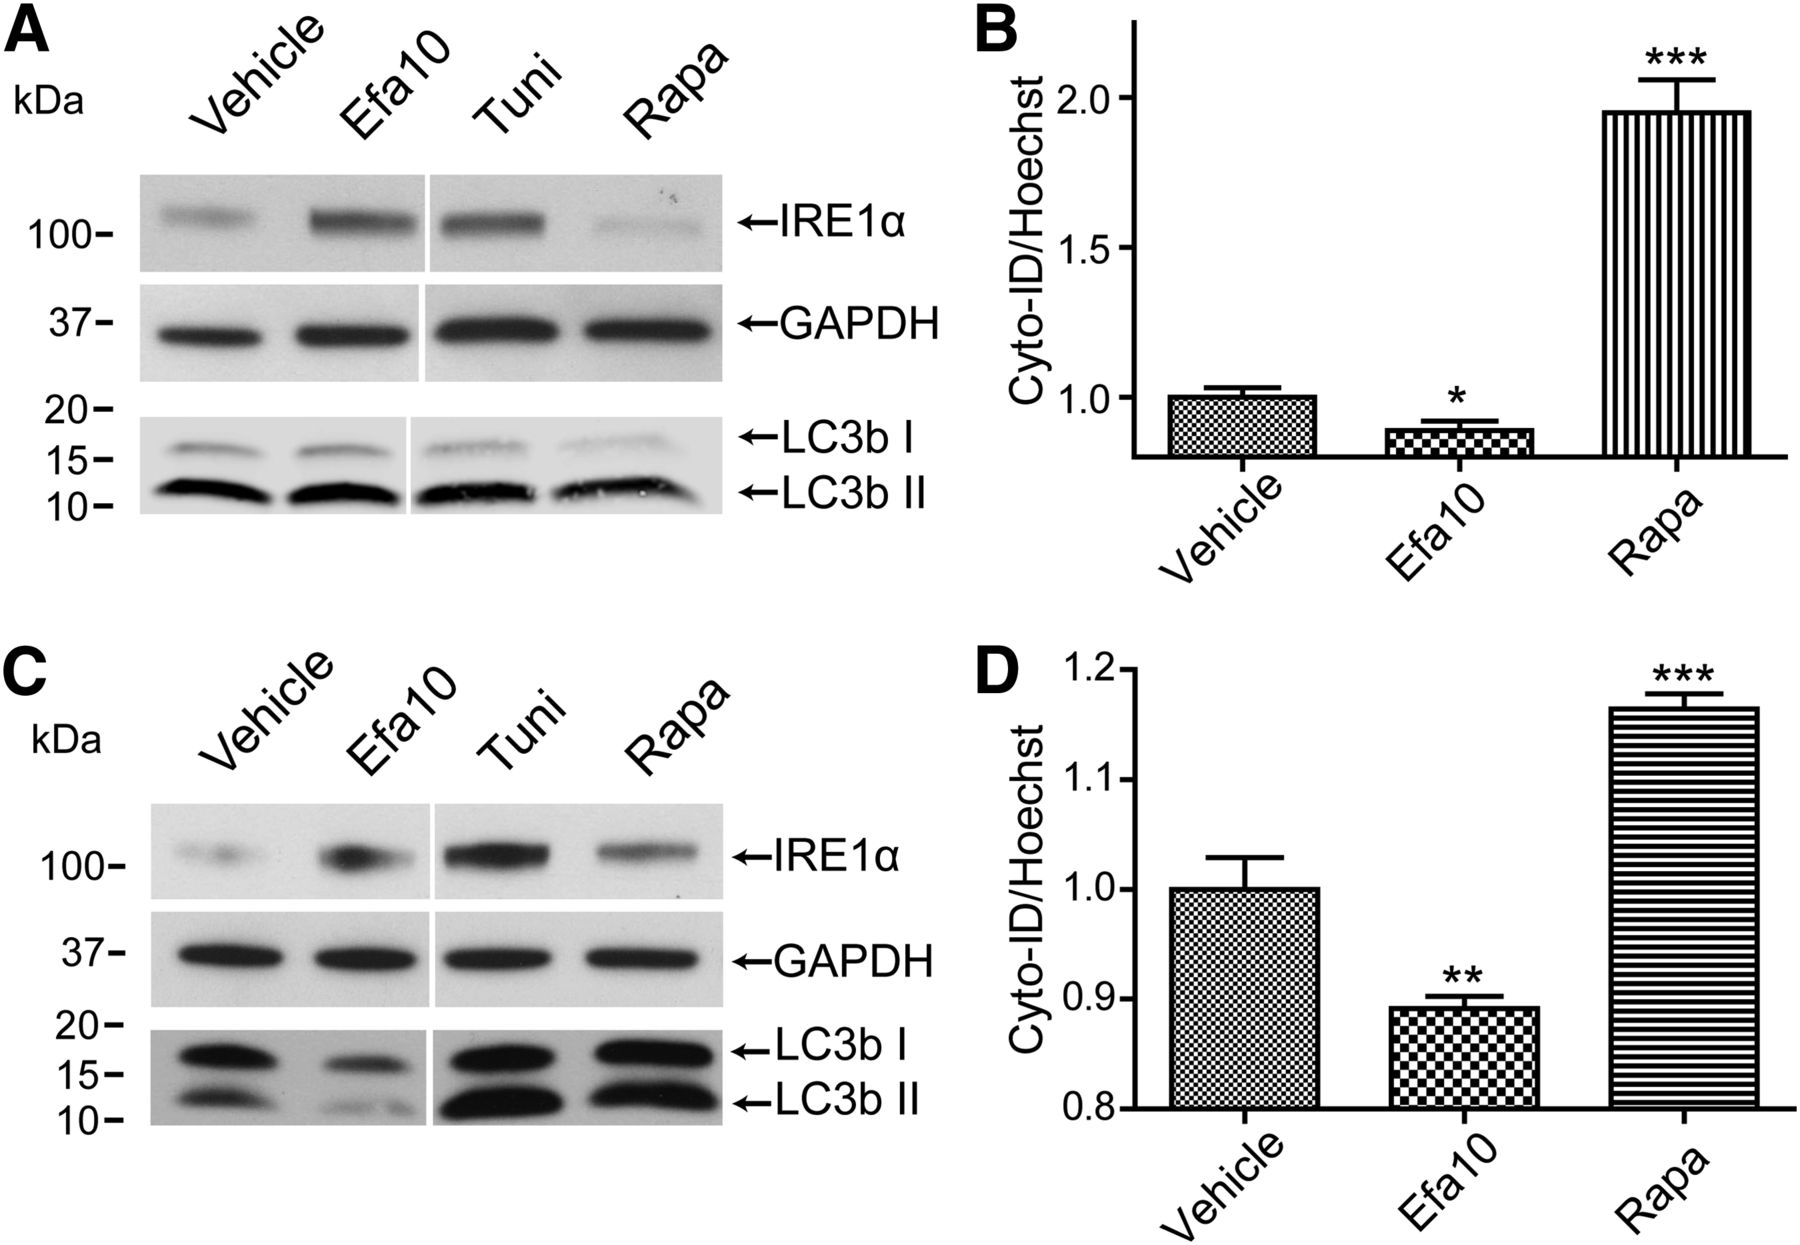 Dysregulation of Endoplasmic Reticulum Stress and Autophagic